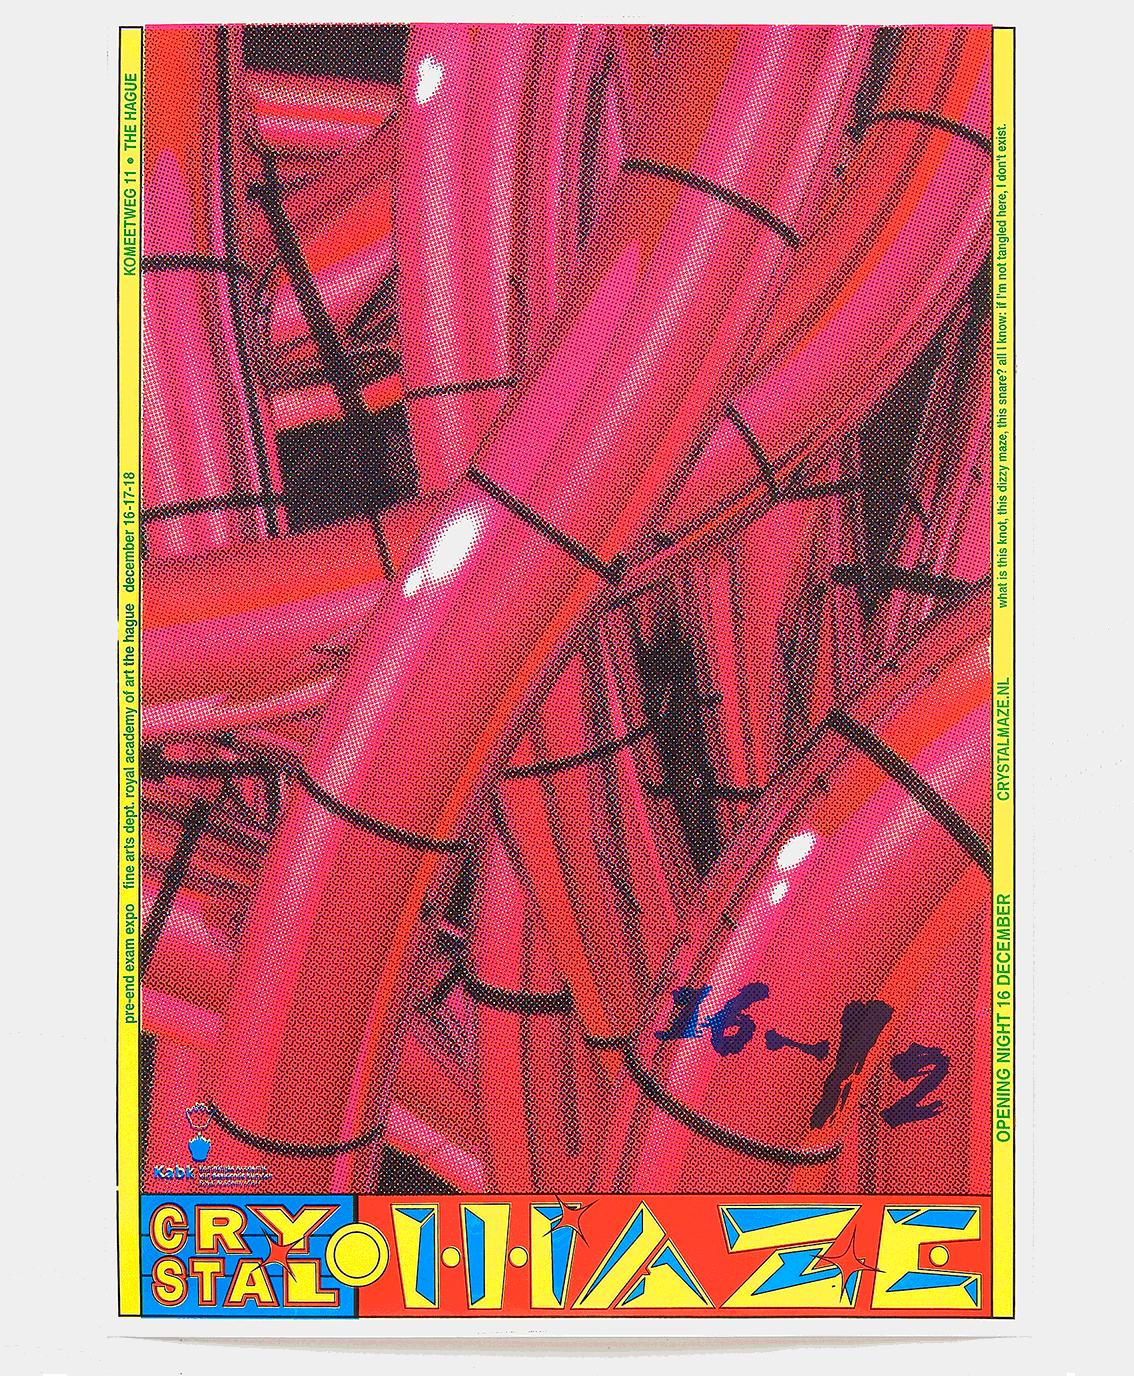 2016_julian_sirre_crystal_maze_kabk.png